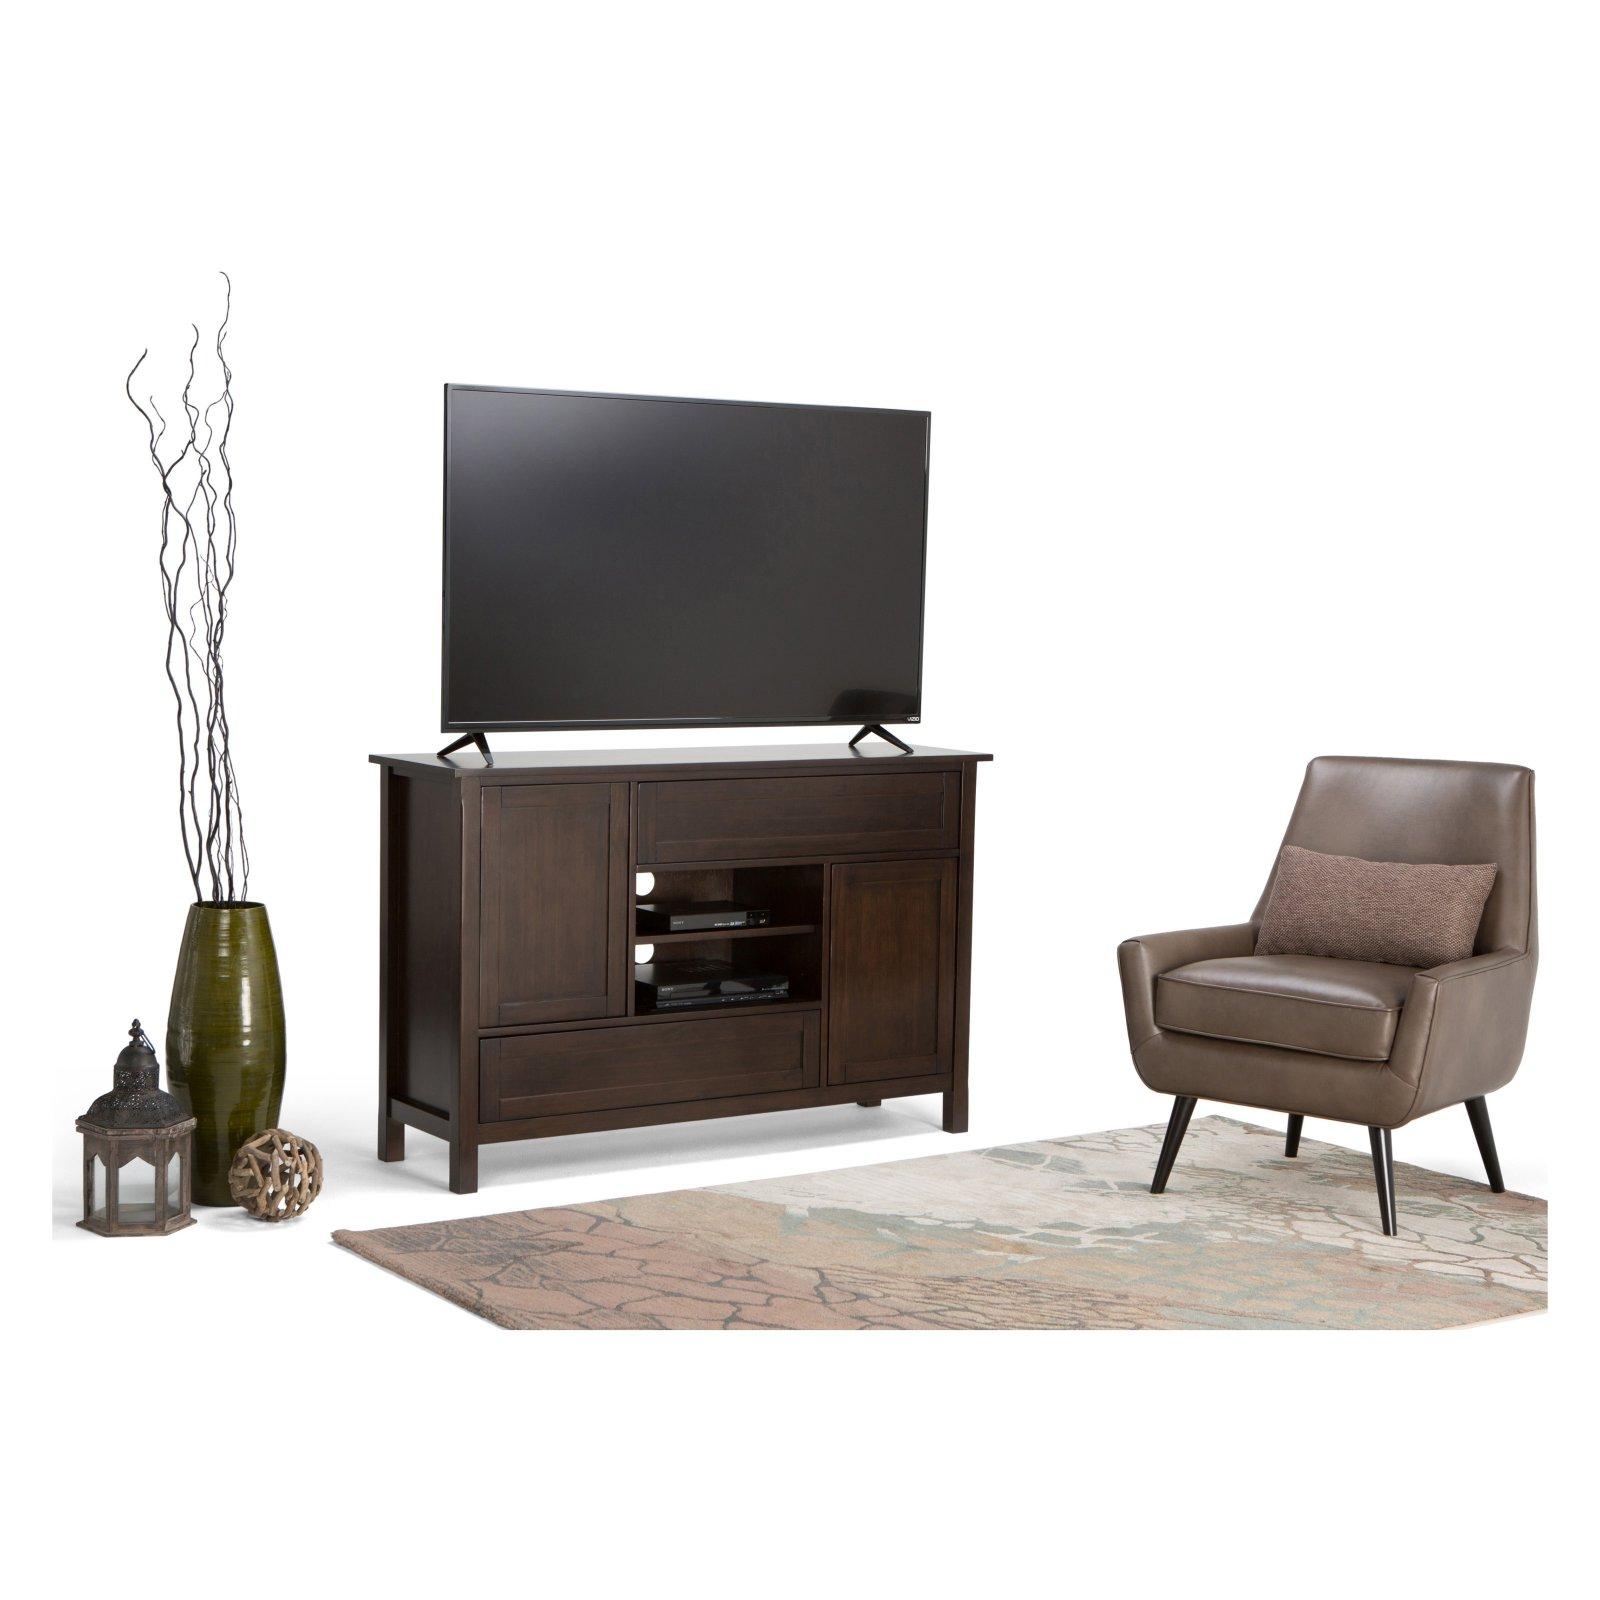 "Simpli Home Sidney 54"" Tall TV Stand"